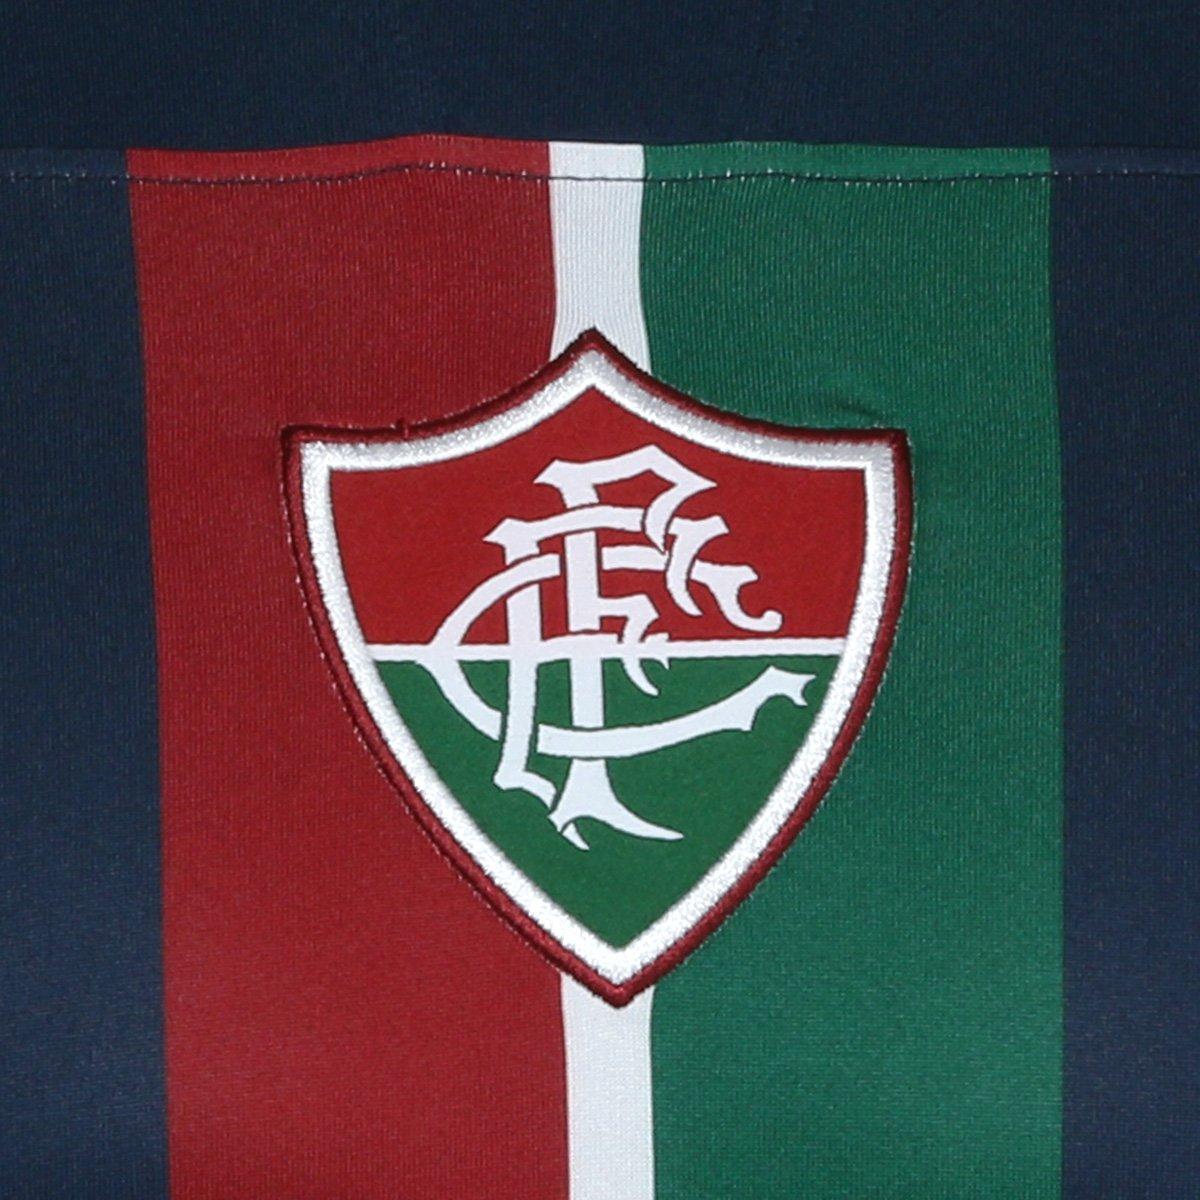 ... Camisa Fluminense III 19 20 s n° - Torcedor Under Armour Masculina ... e0a44f1746aa2